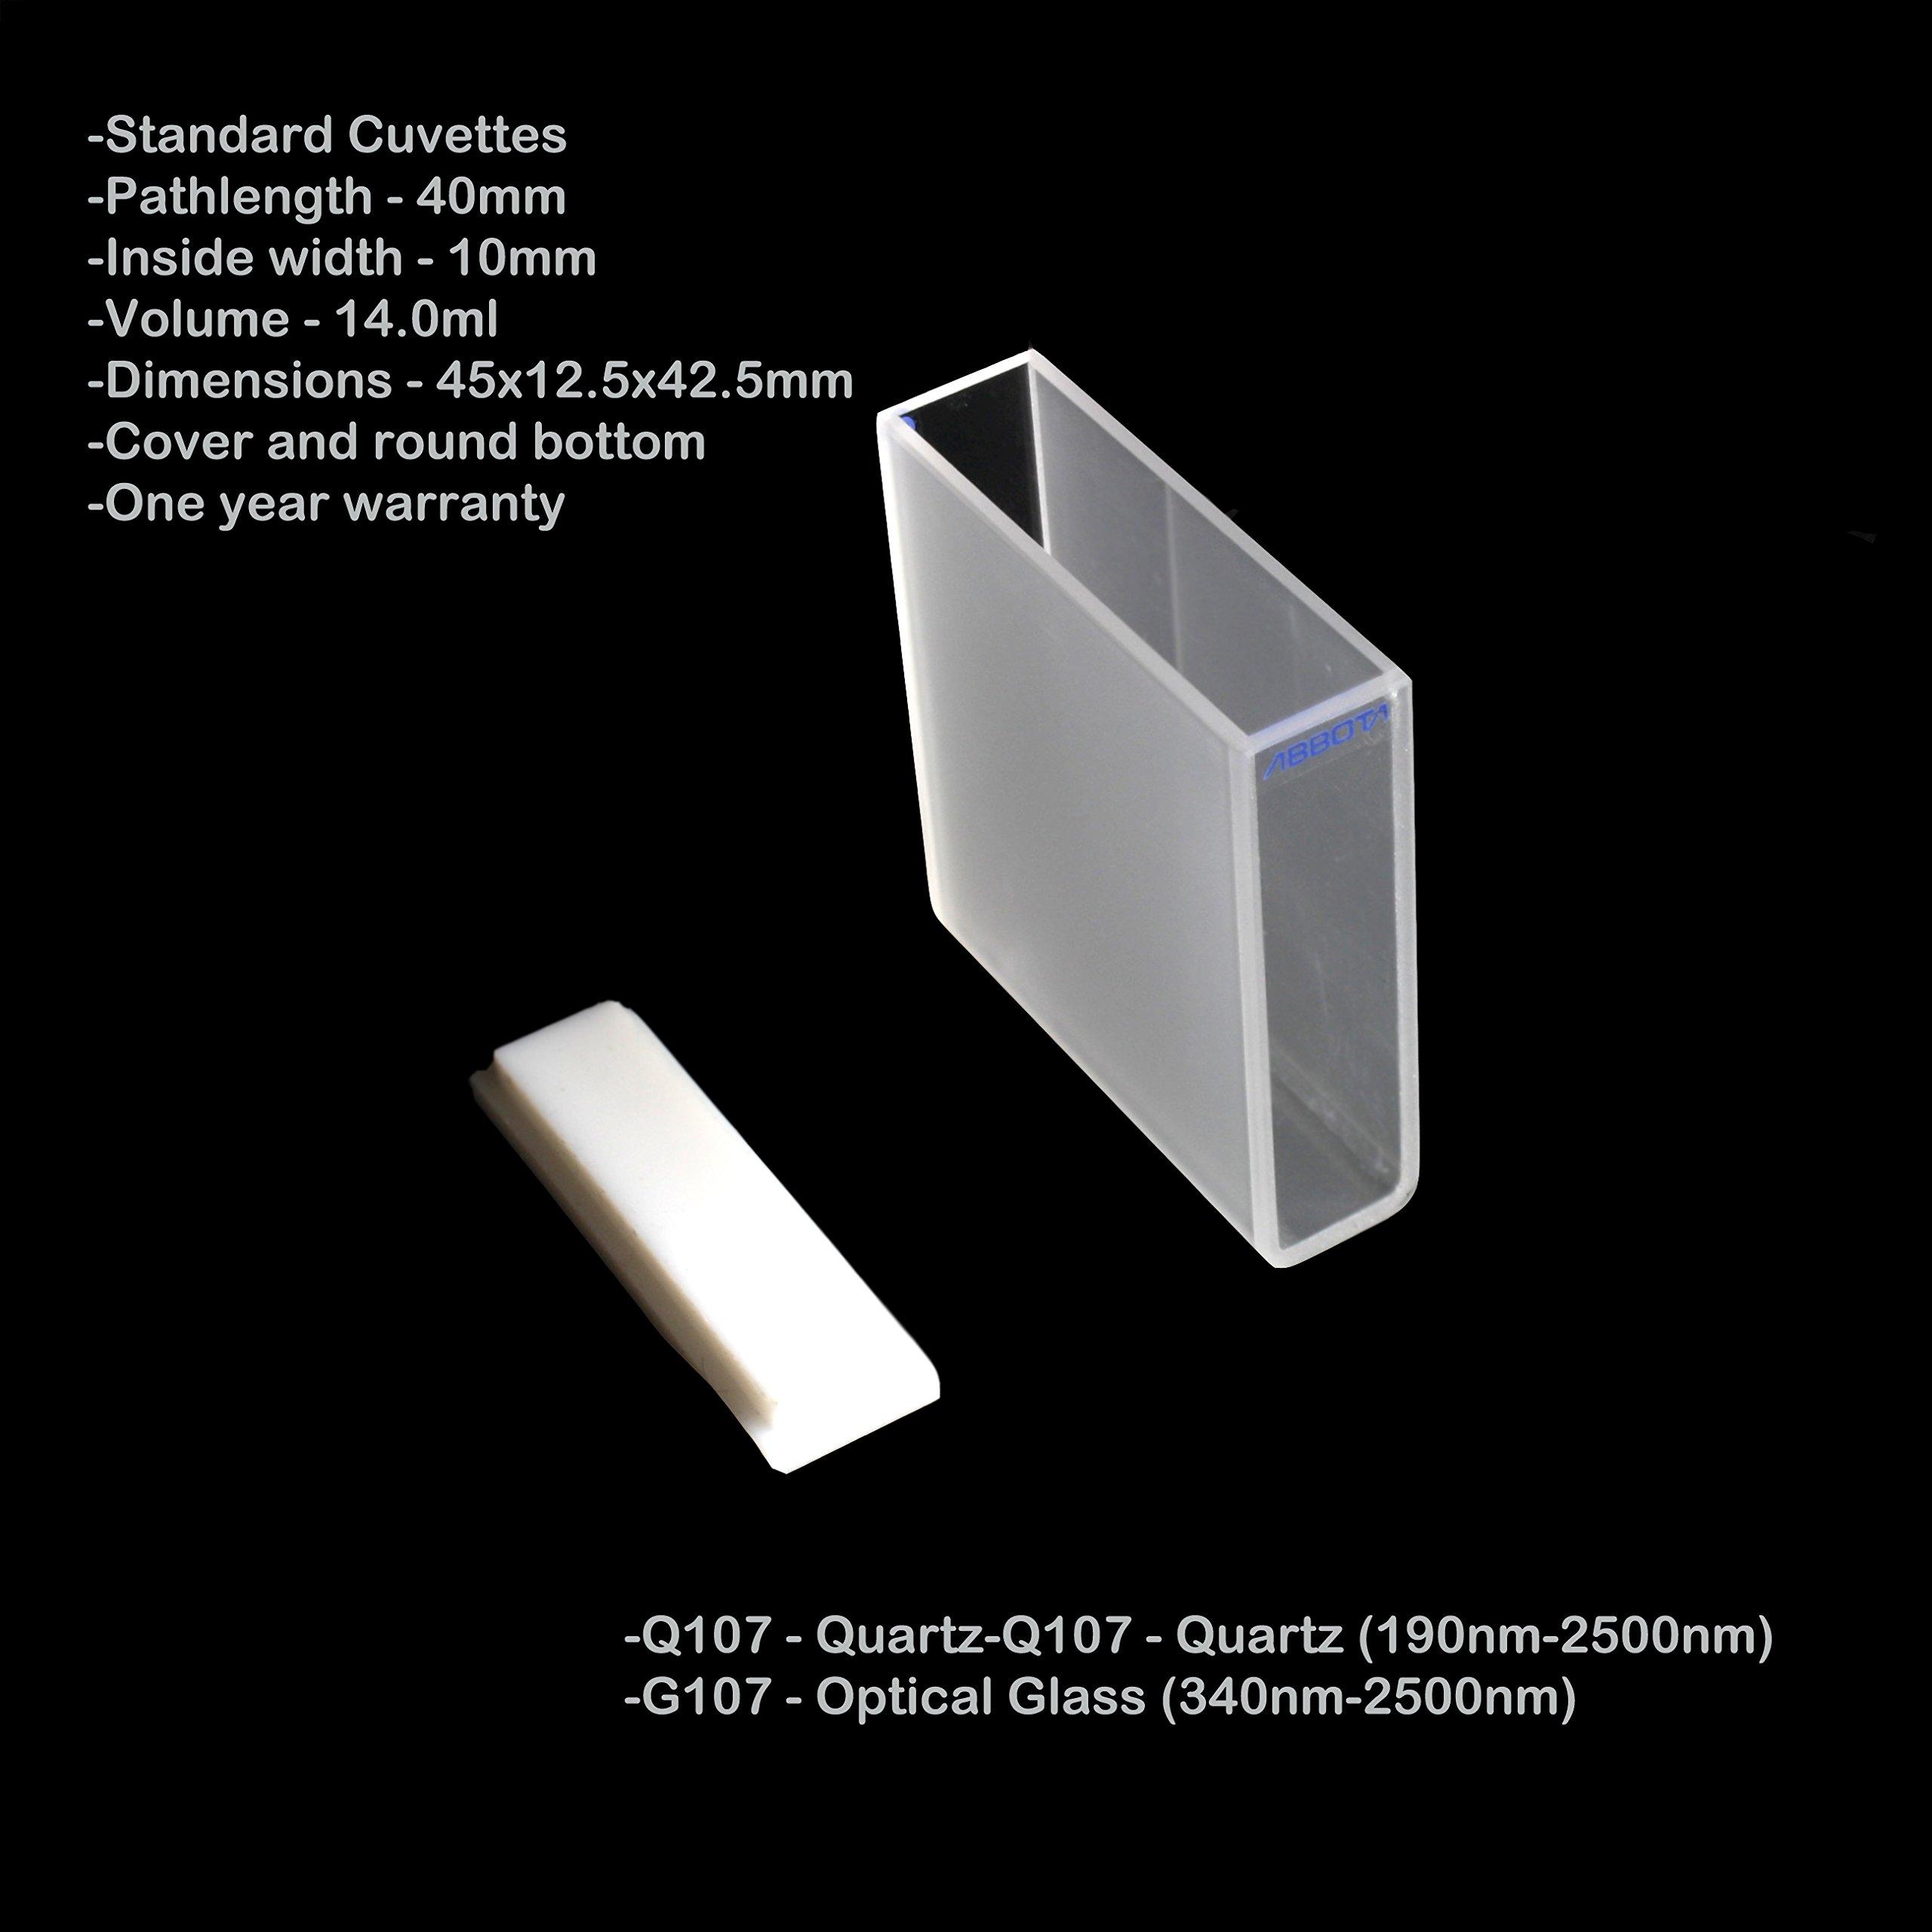 40mm Pathlength Glass Cuvettes - 14ml